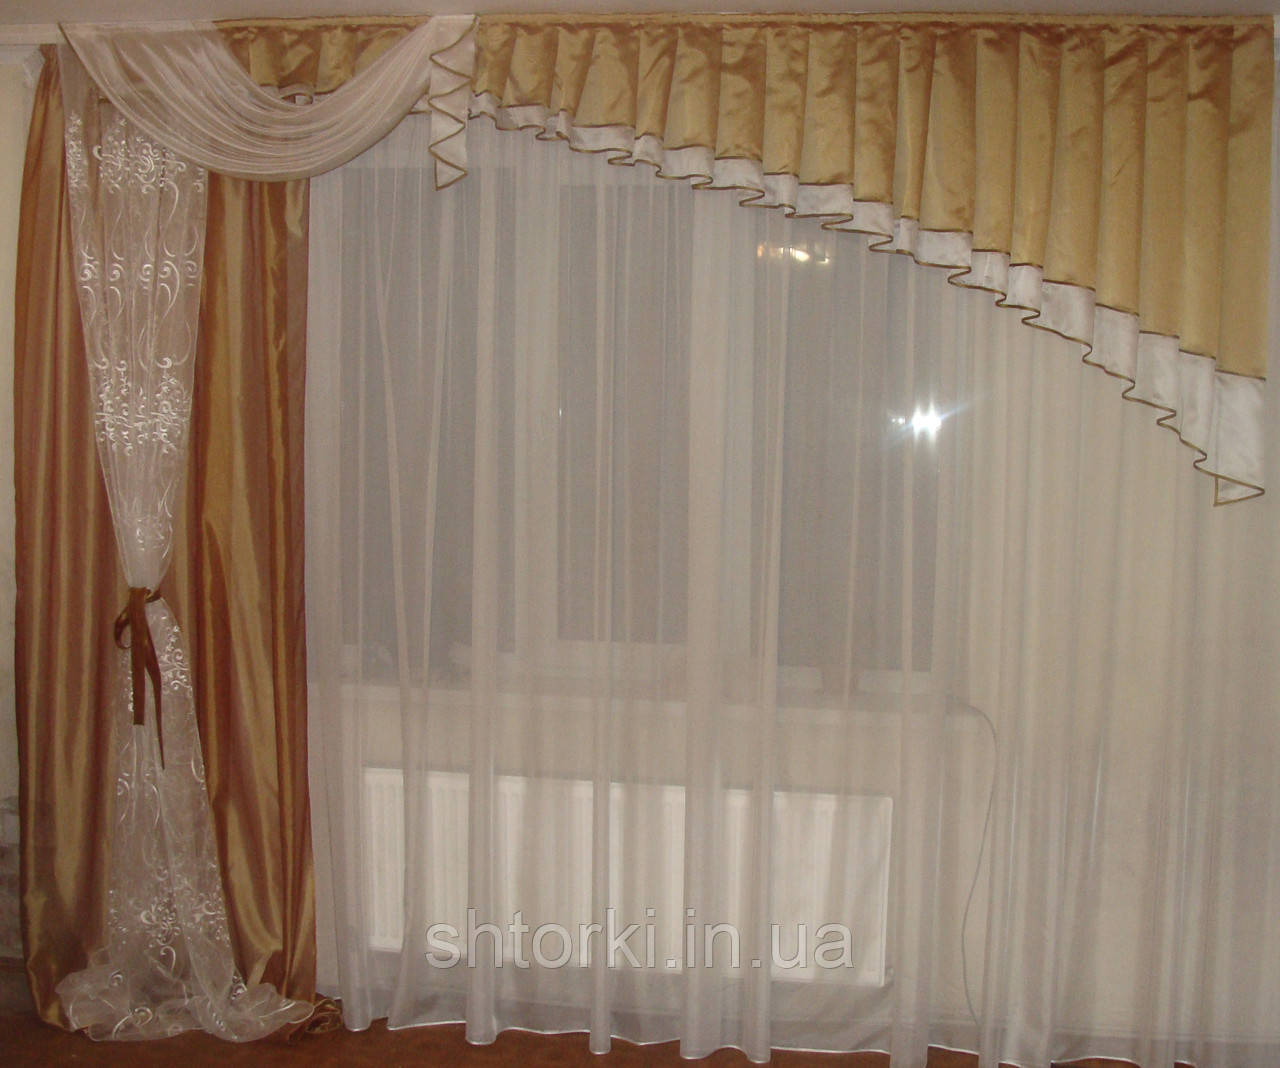 Ламбрикен Ассиметрия  с шторой 3м Органза коричн